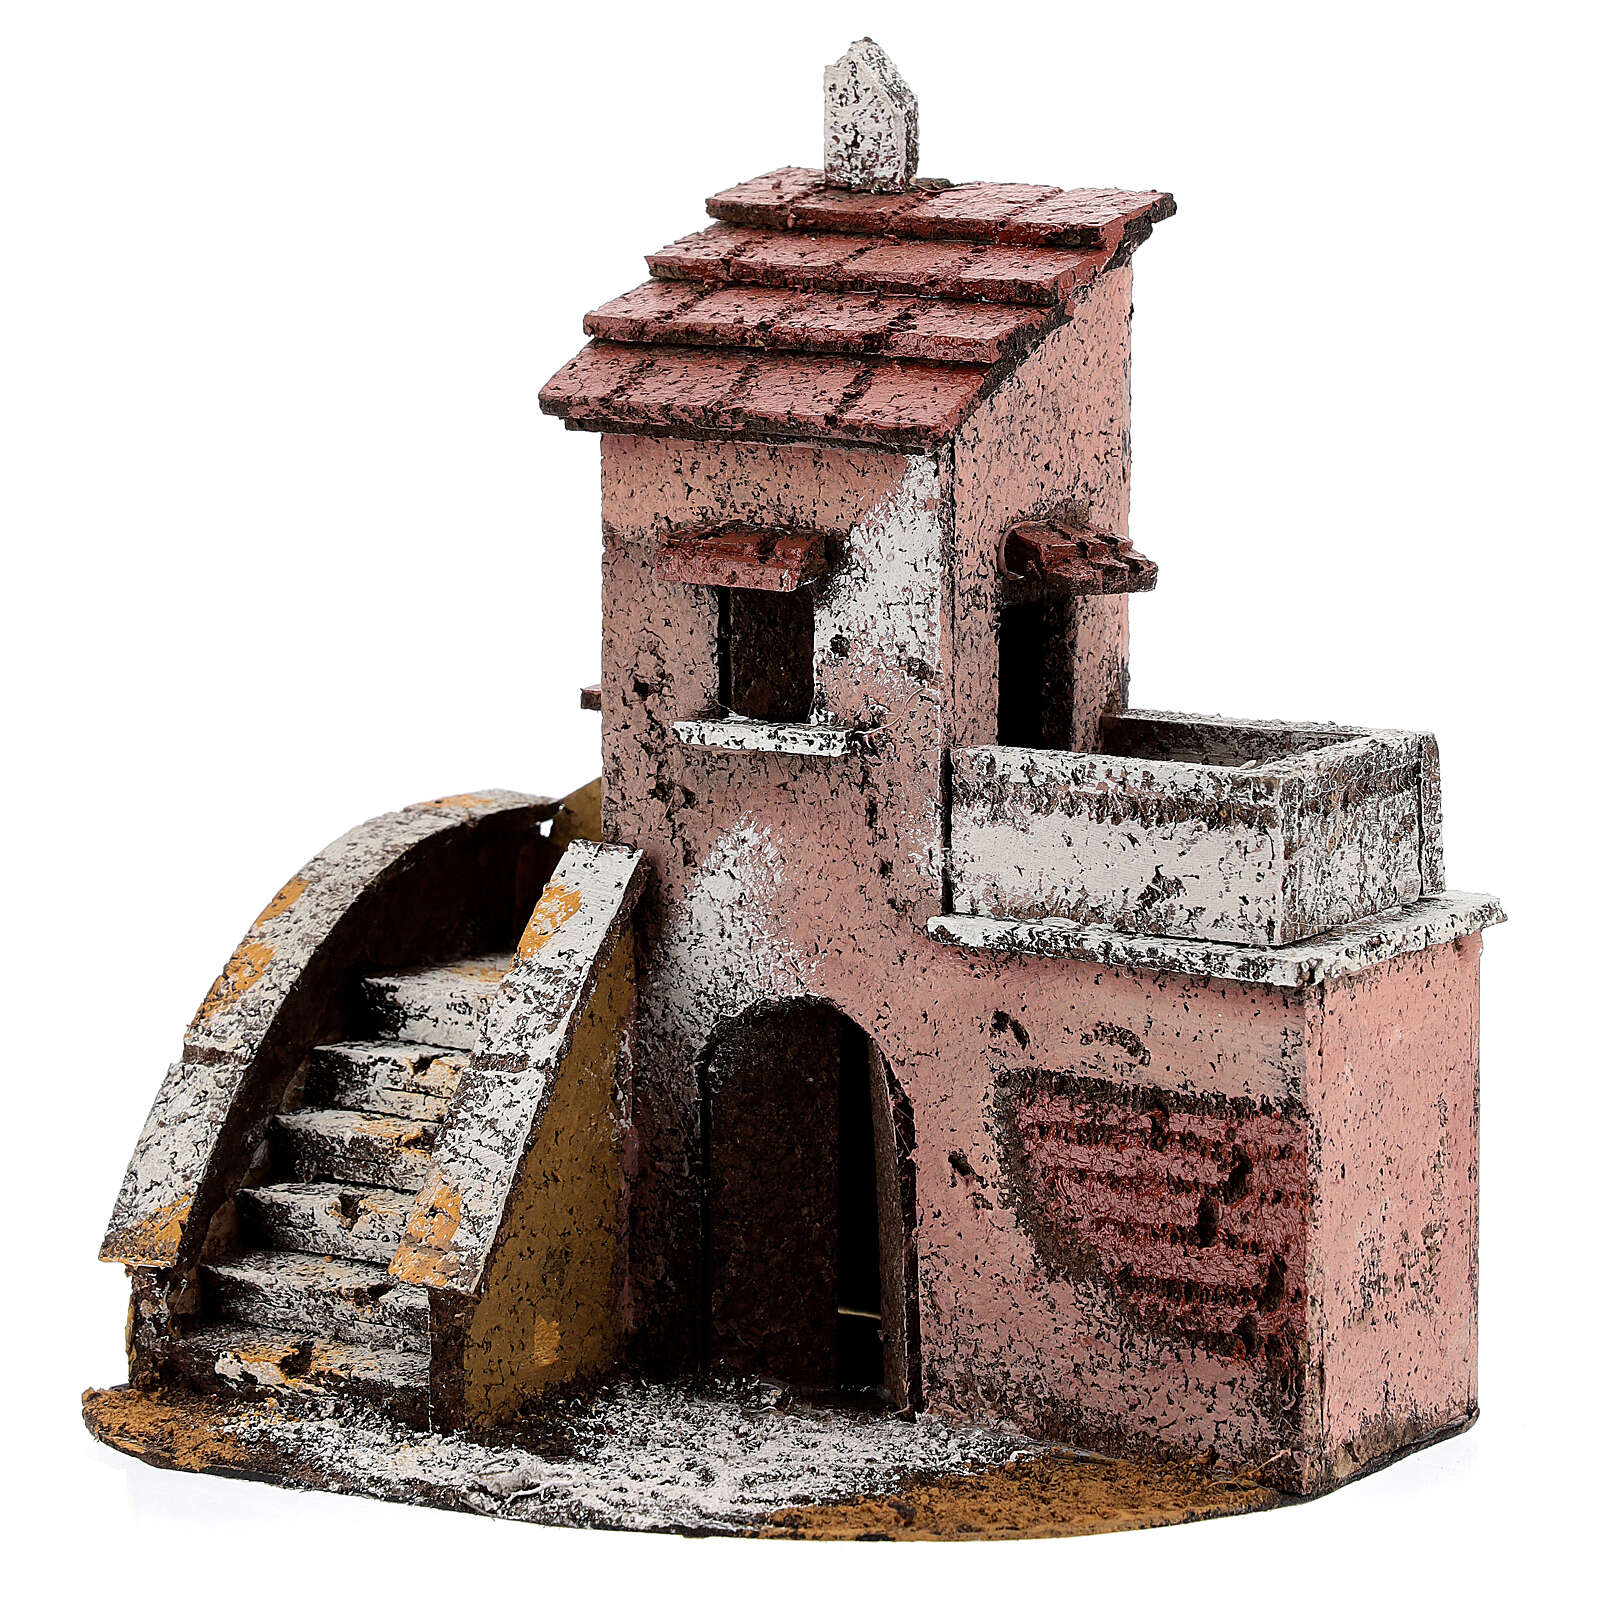 Cork house with balcony Neapolitan Nativity Scene 15x15x10 cm for 4 cm figurines 4